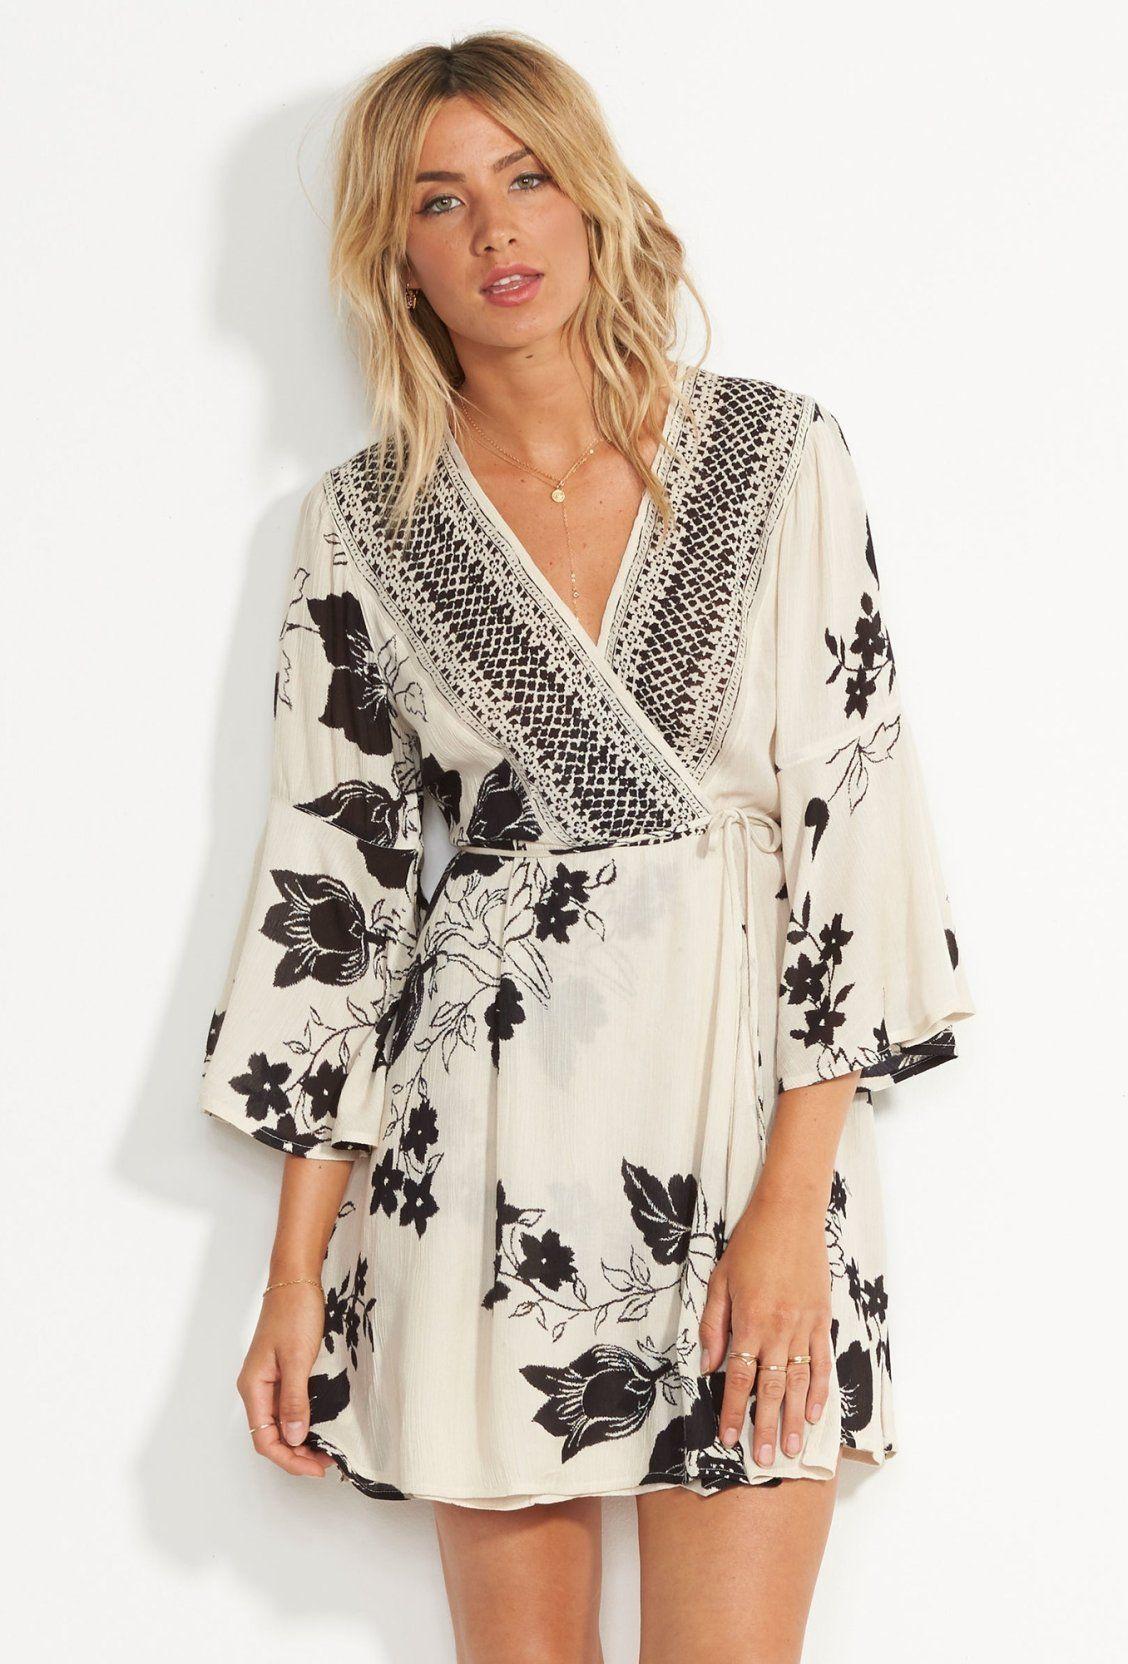 ff16db4cbbc6e Divine Dress   Billabong US Billabong Women, Classic Outfits, Festival  Fashion, Summer Outfits